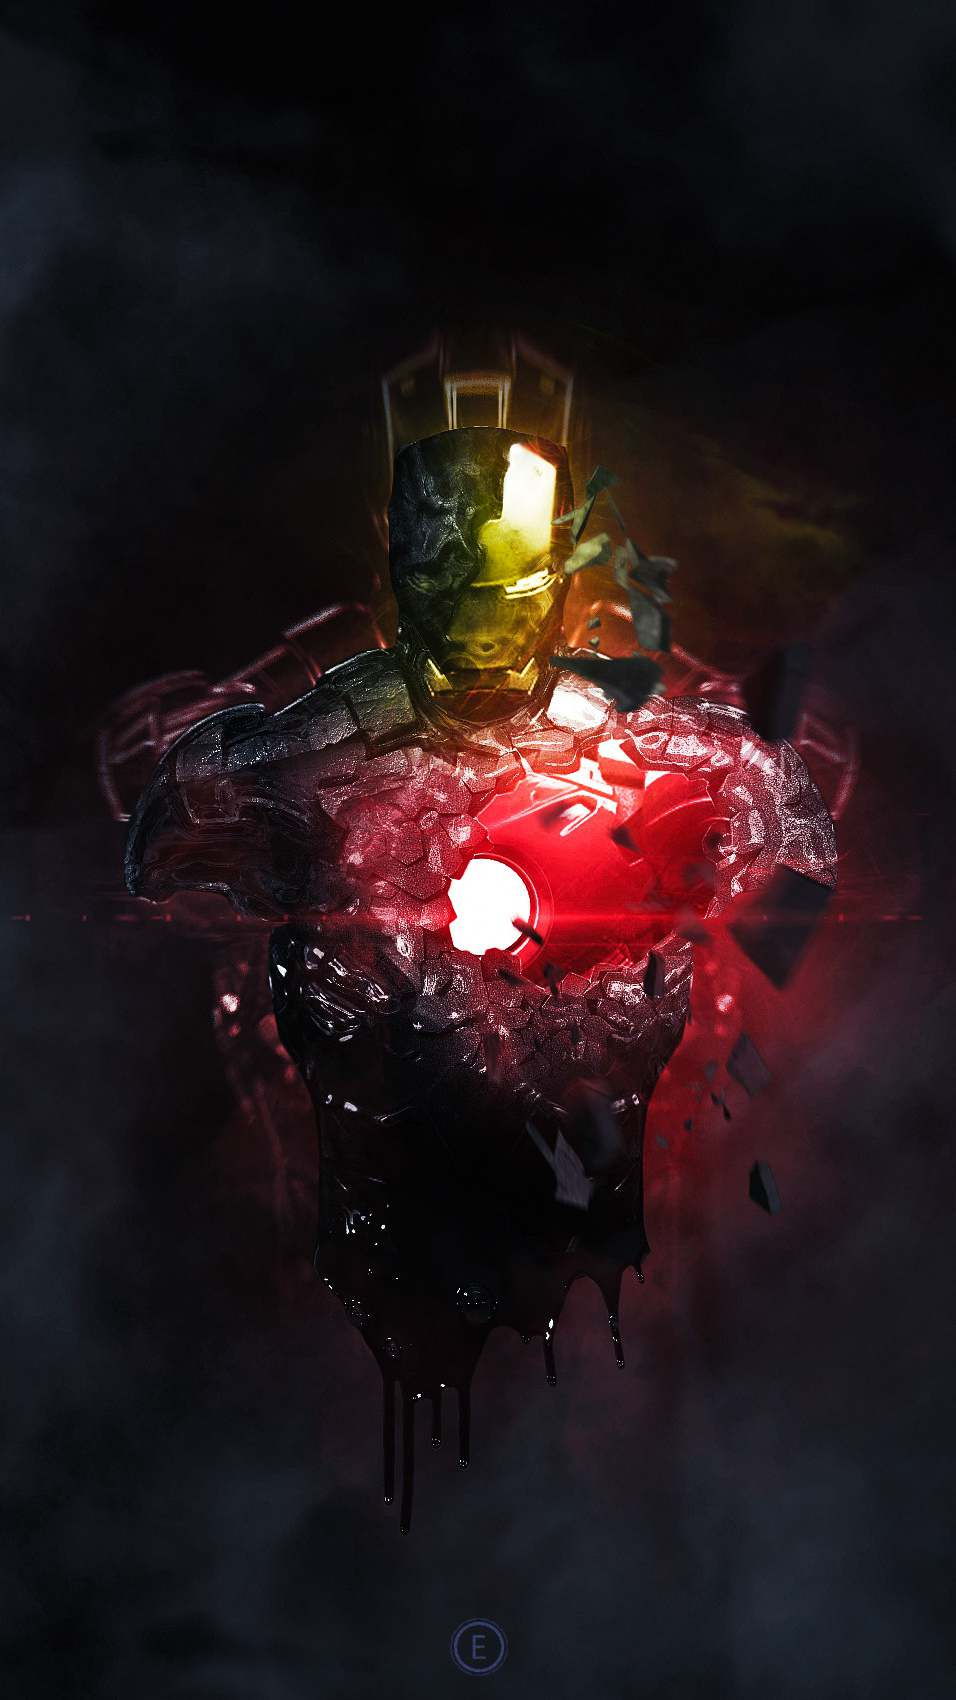 Iron Man Armor Art iPhone Wallpaper